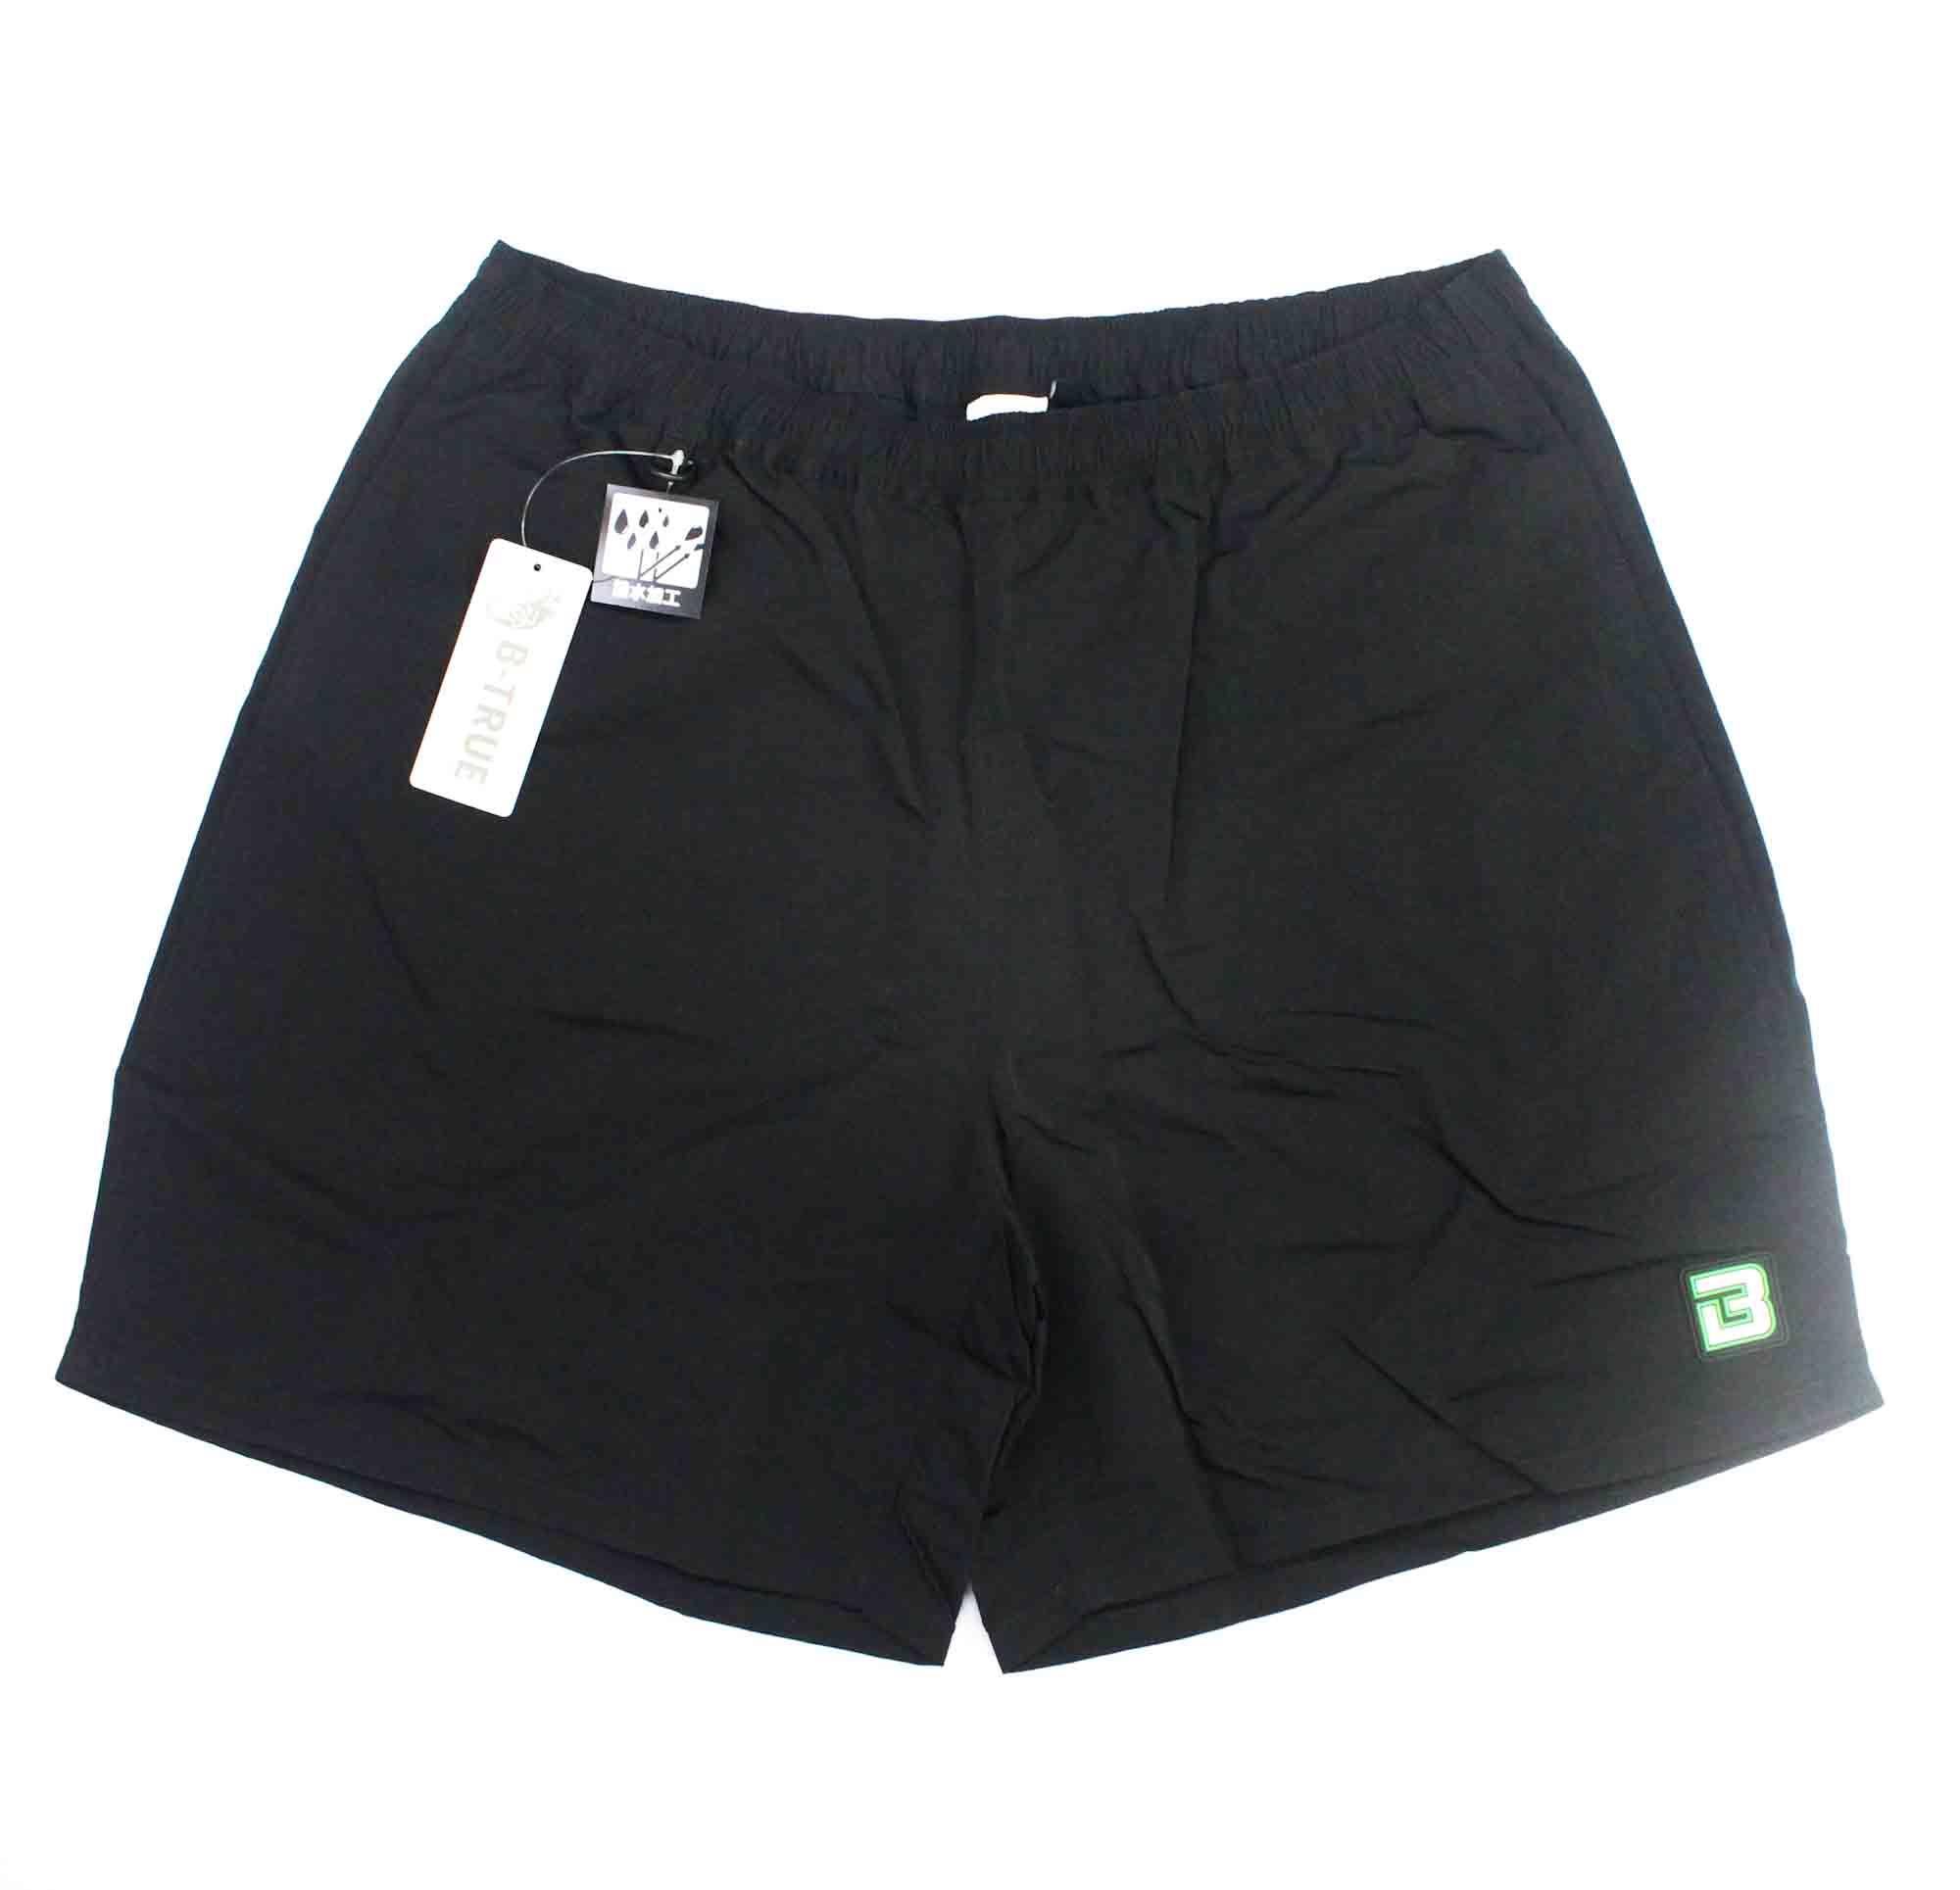 Evergreen Pants Shorts B True Size L Black (1355)